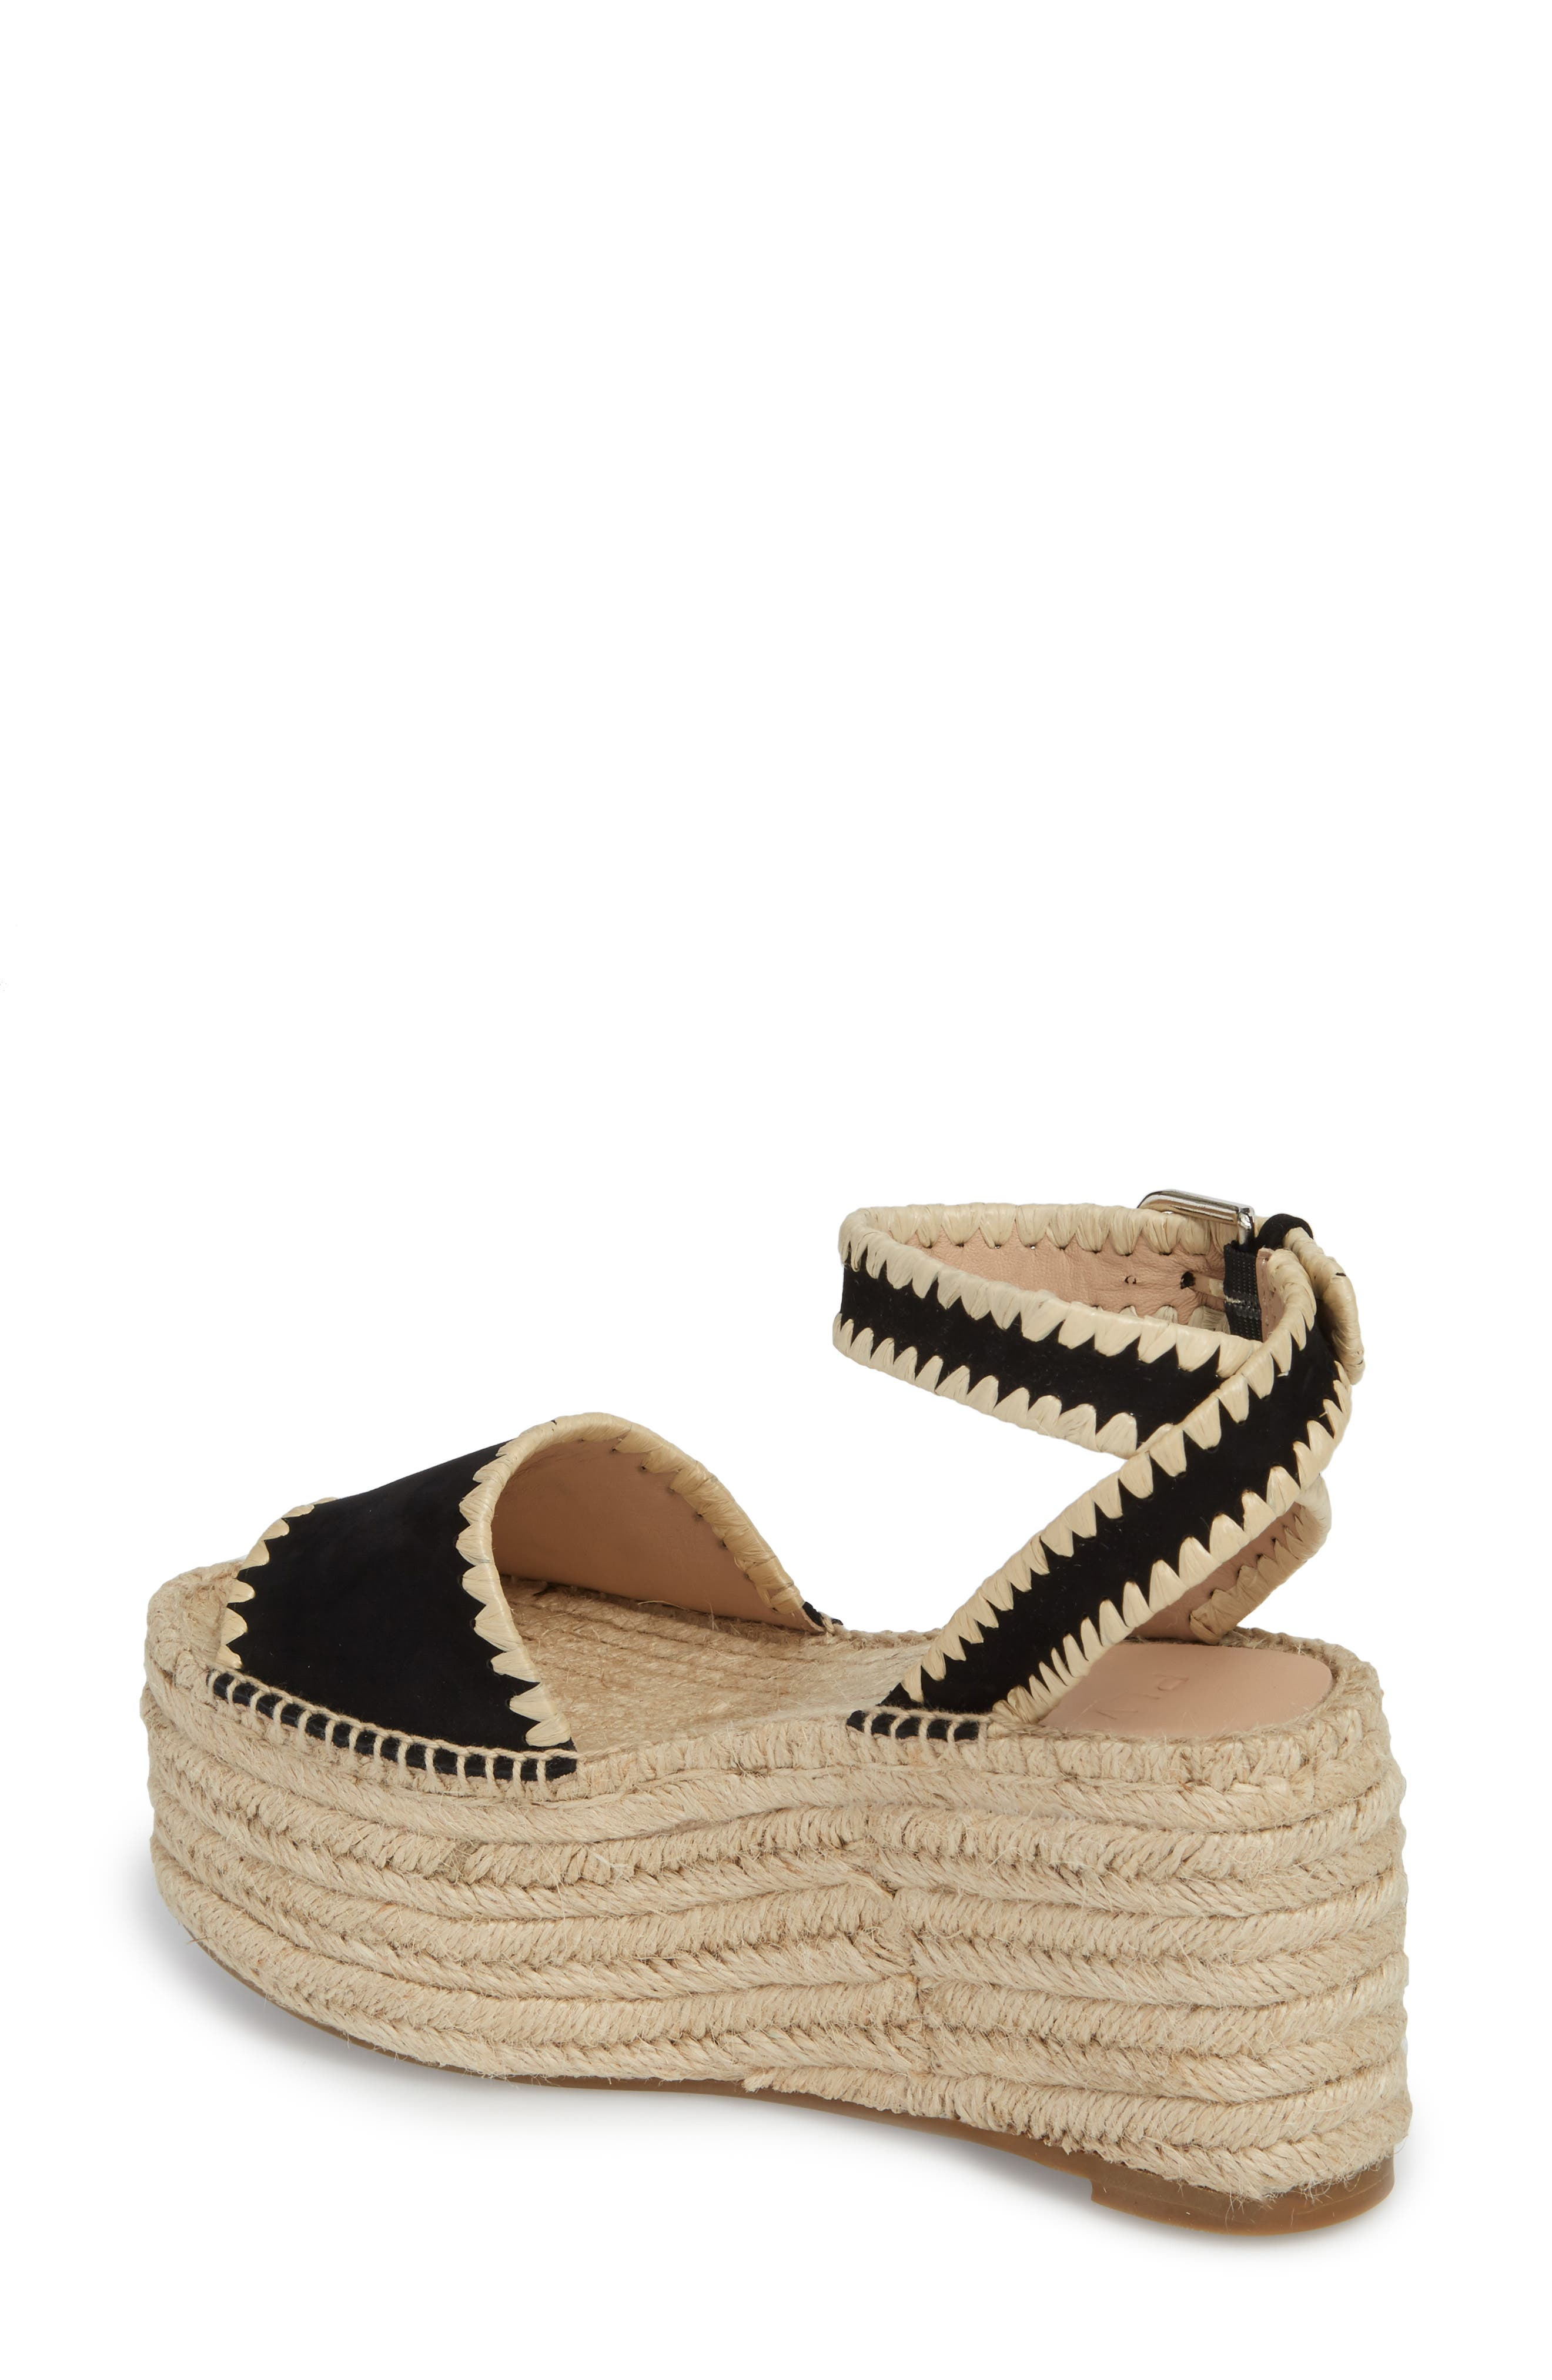 Ria Espadrille Platform Sandal,                             Alternate thumbnail 2, color,                             Black Leather